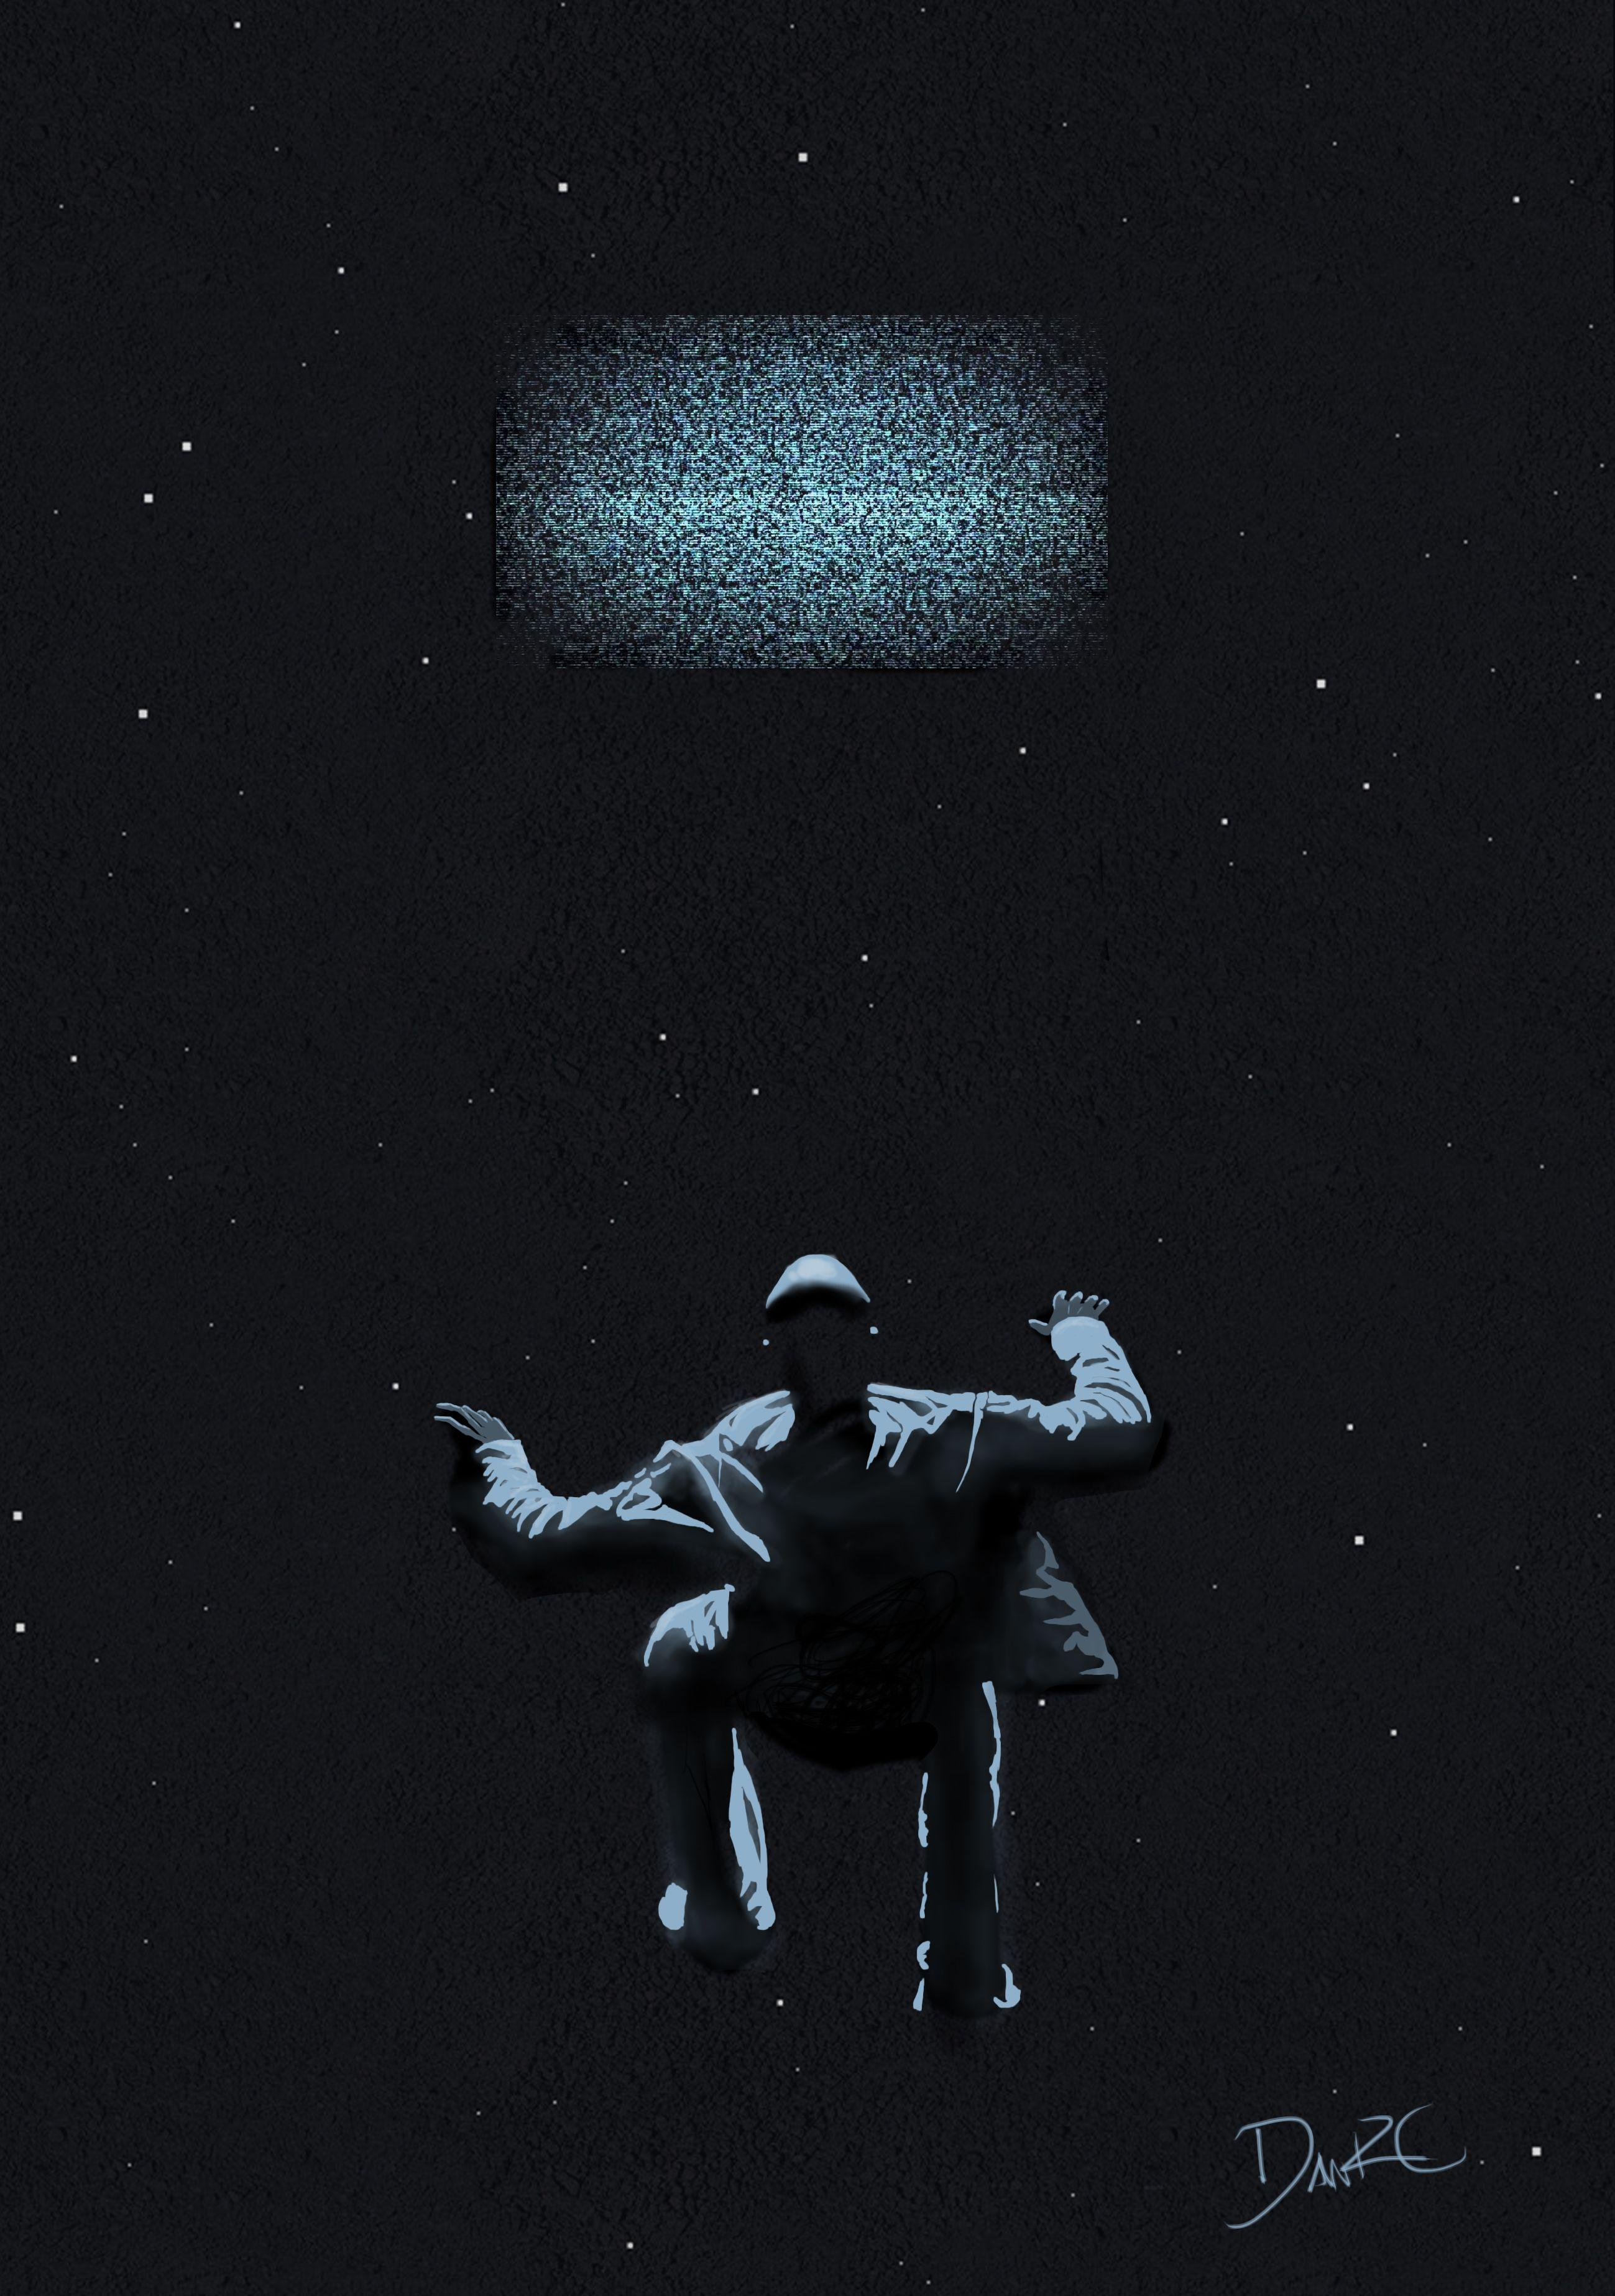 The Sunken Place Get Out Horror Artwork Alternative Movie Posters Film Stills